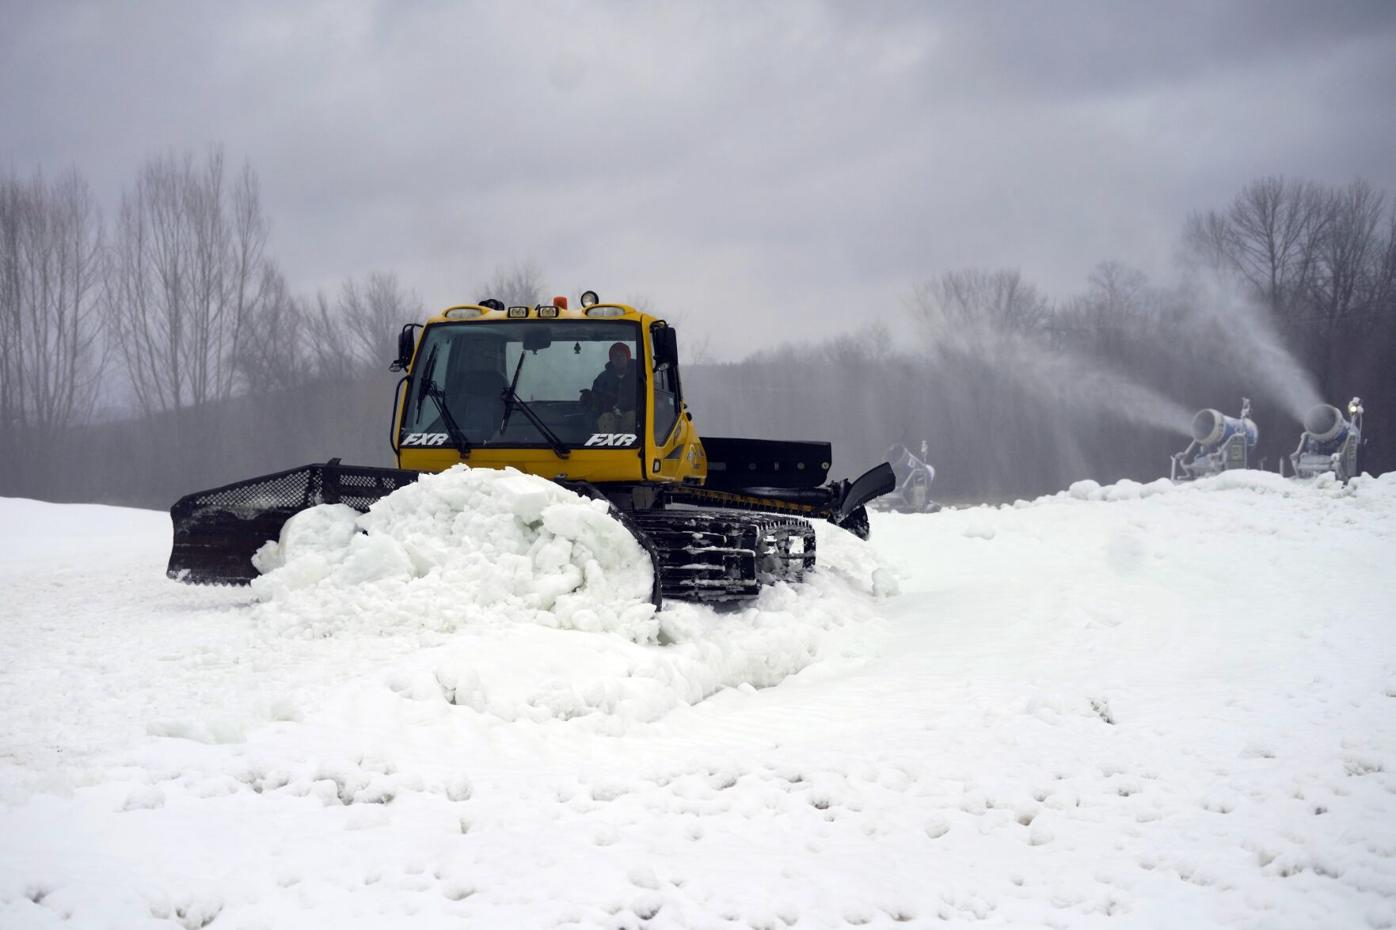 Snowmobile practice course